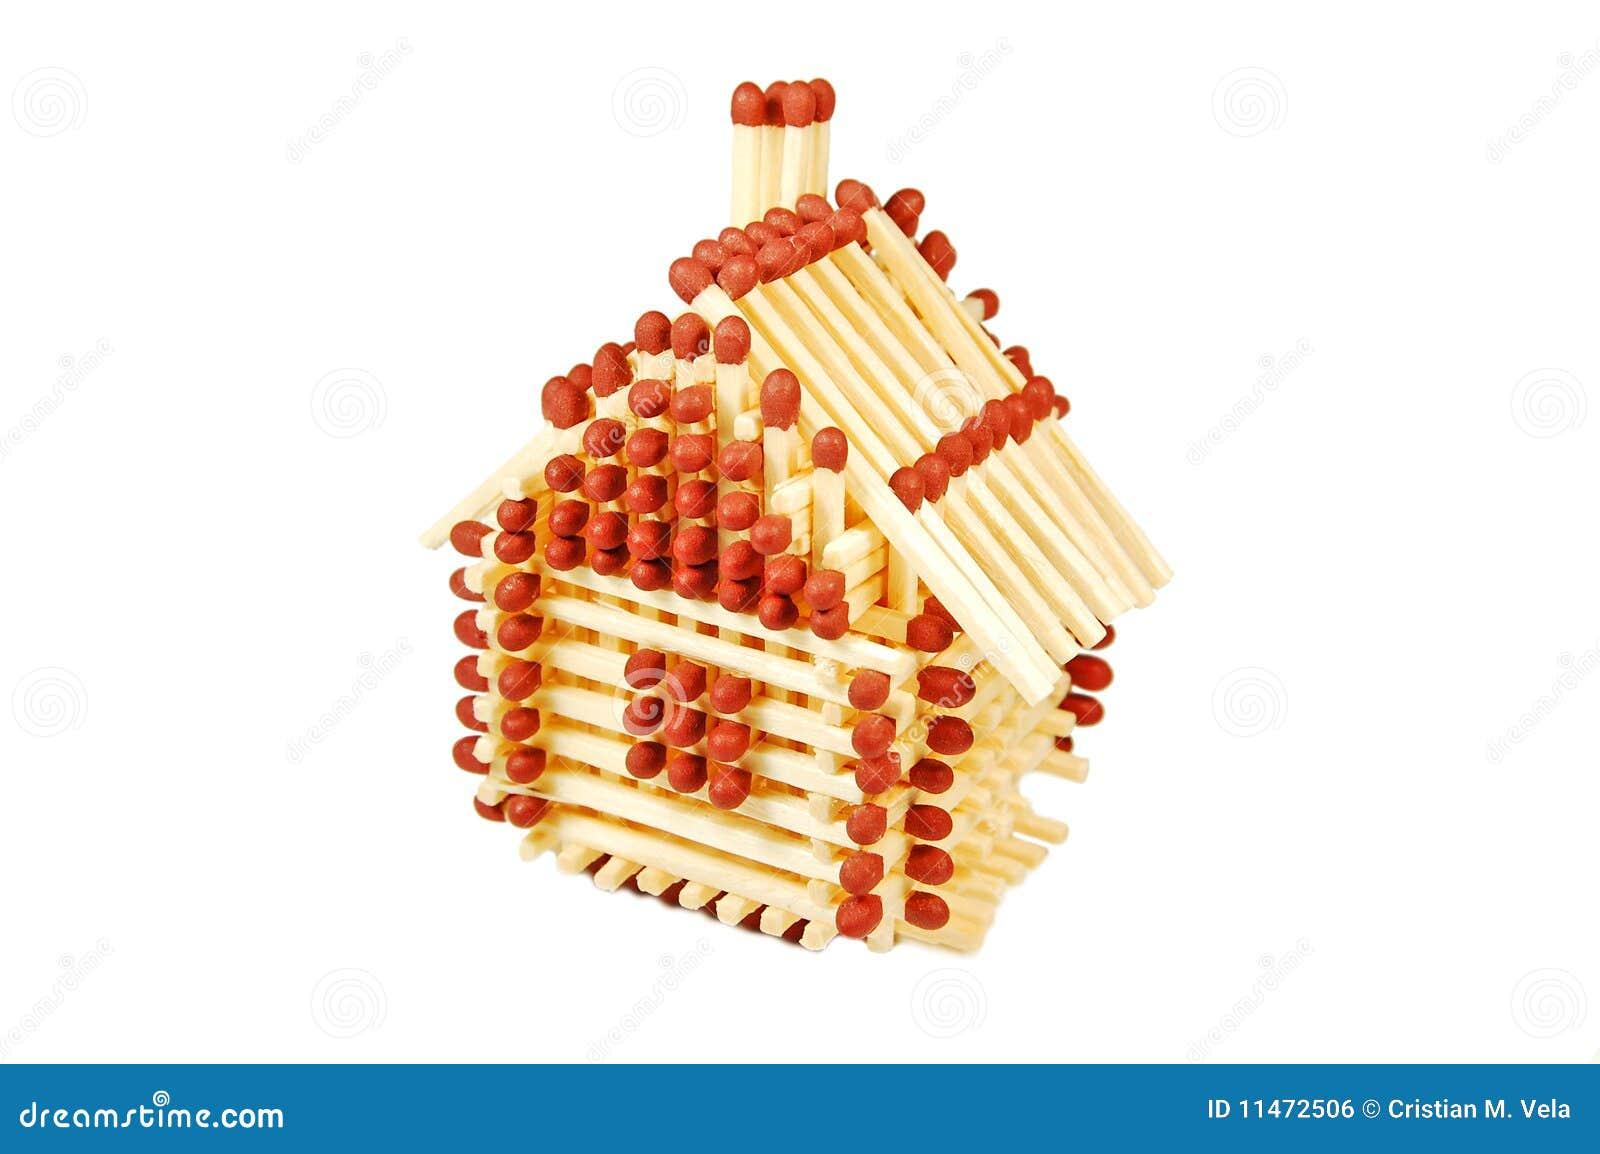 match house royalty free stock image image 11472506